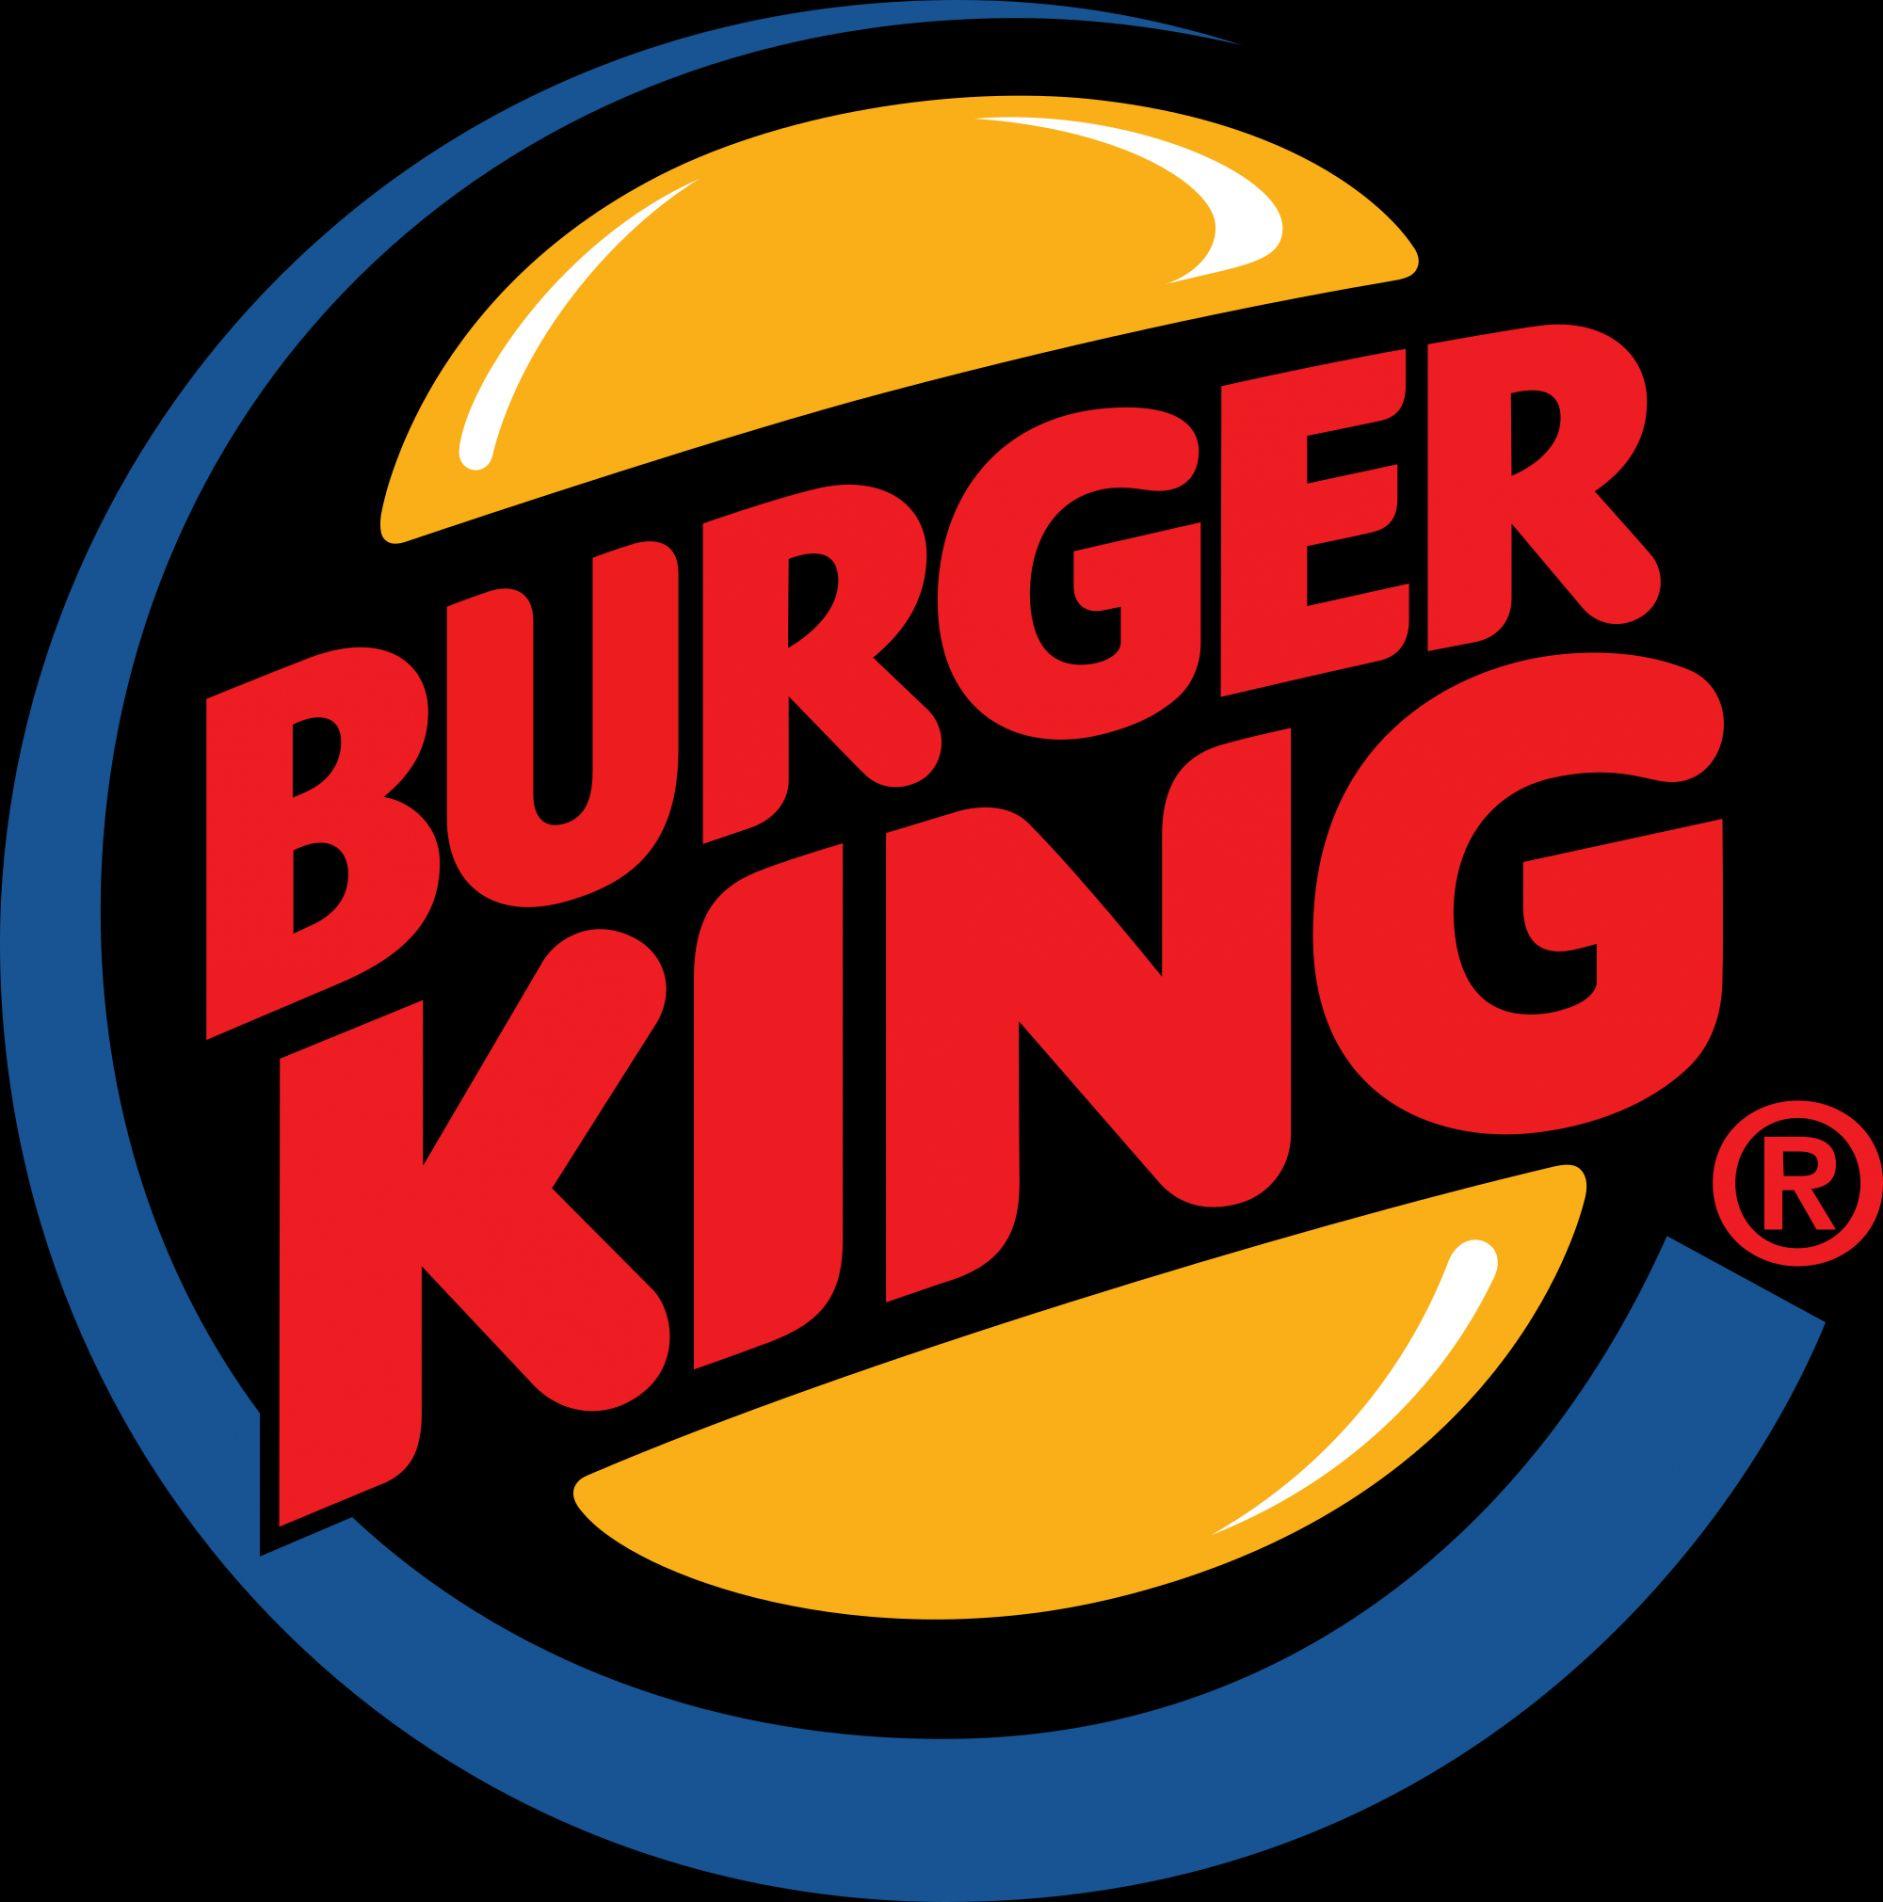 High Quality Burger King Symbol Blank Meme Template